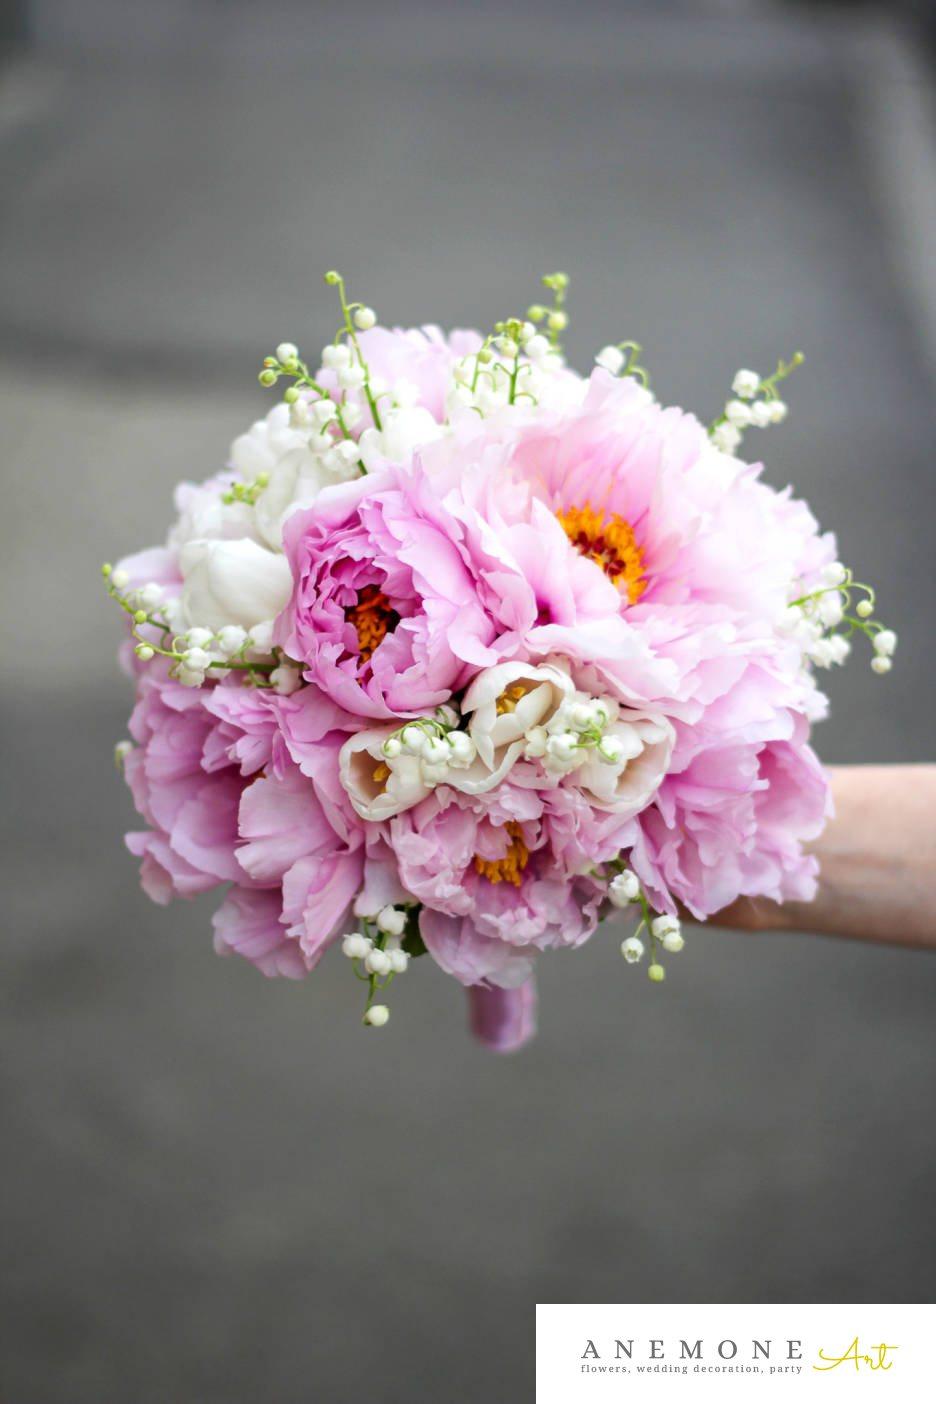 Poza, foto cu Flori de nunta alb, buchet mireasa, bujori, lacramioare, lalele, rotund, roz in Arad, Timisoara, Oradea (wedding flowers, bouquets) nunta Arad, Timisoara, Oradea